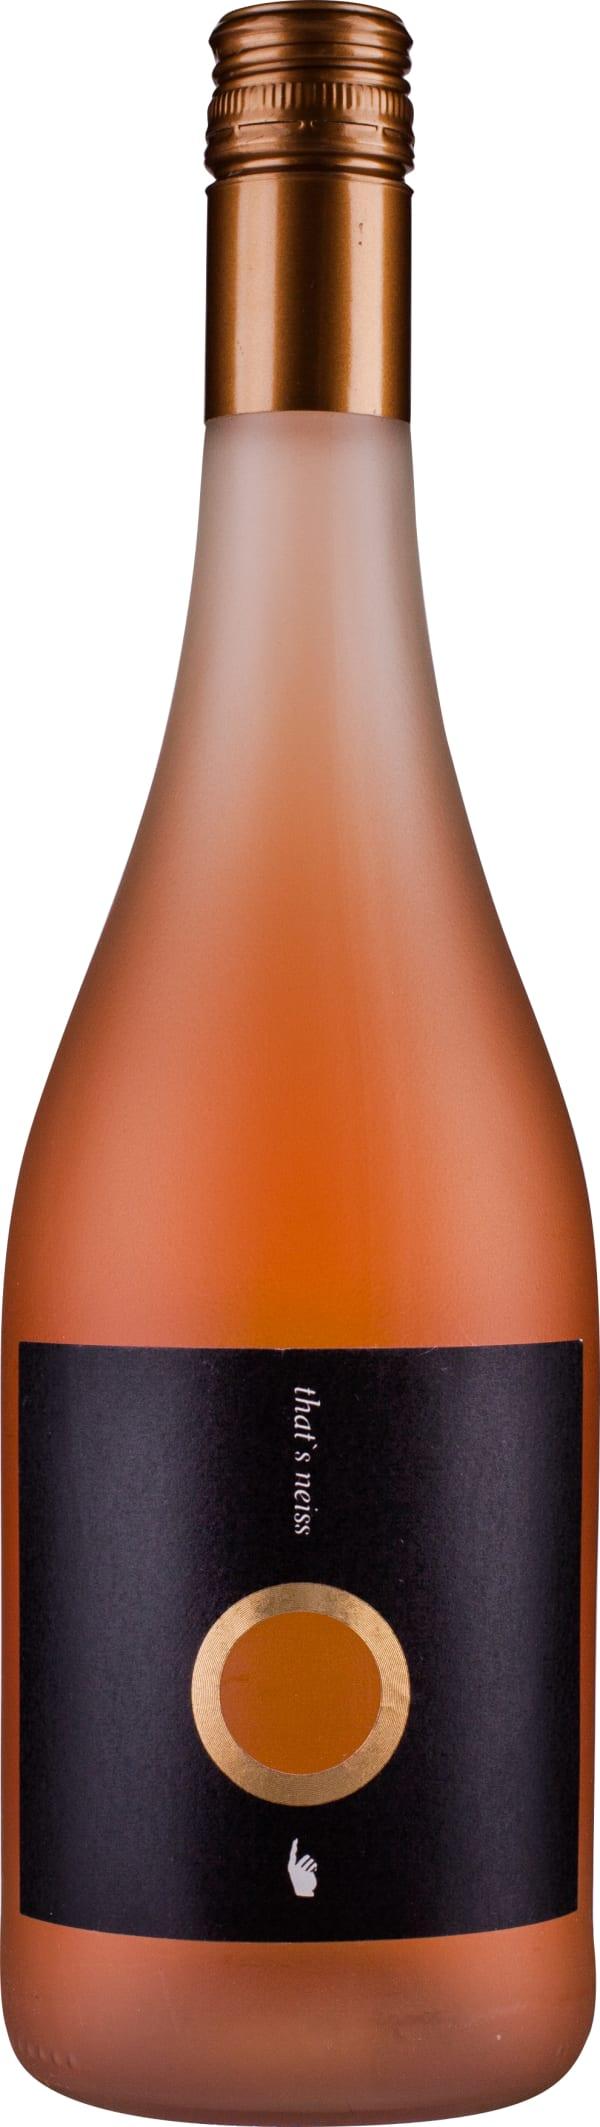 That's Neiss Pinot Noir Rosé Trocken 2018